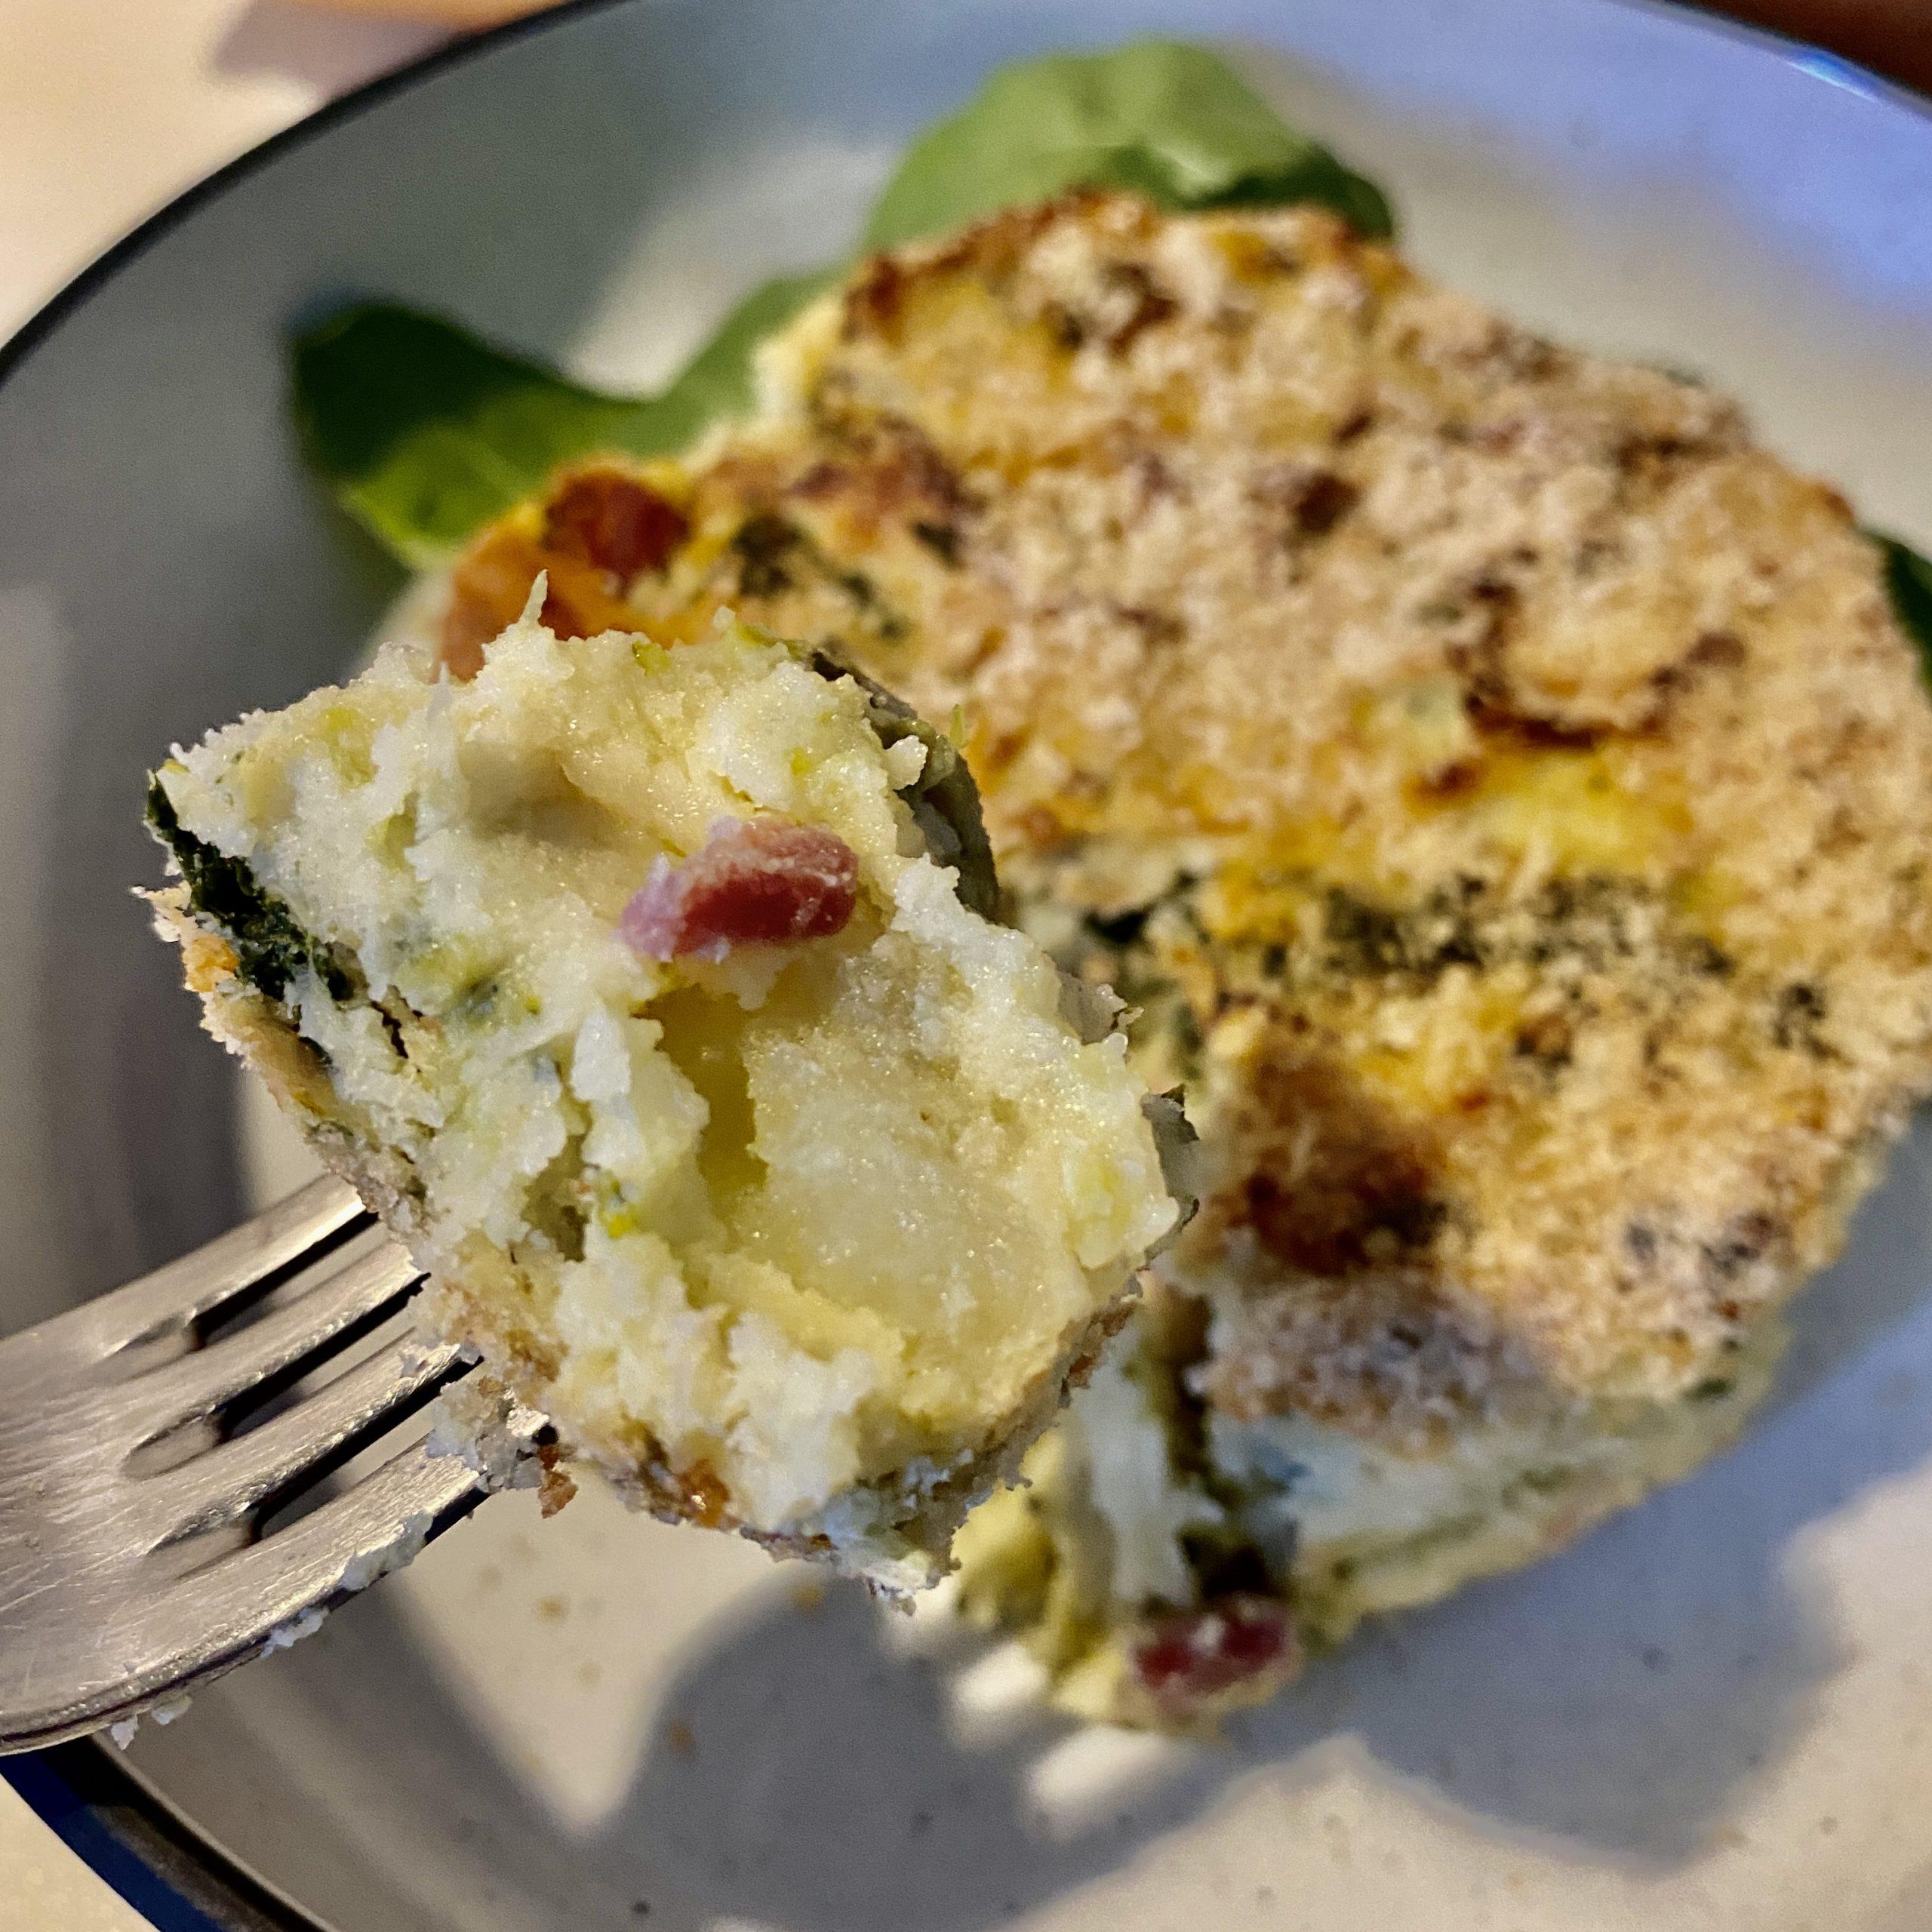 Gateau di patate, broccoli e spinacini.